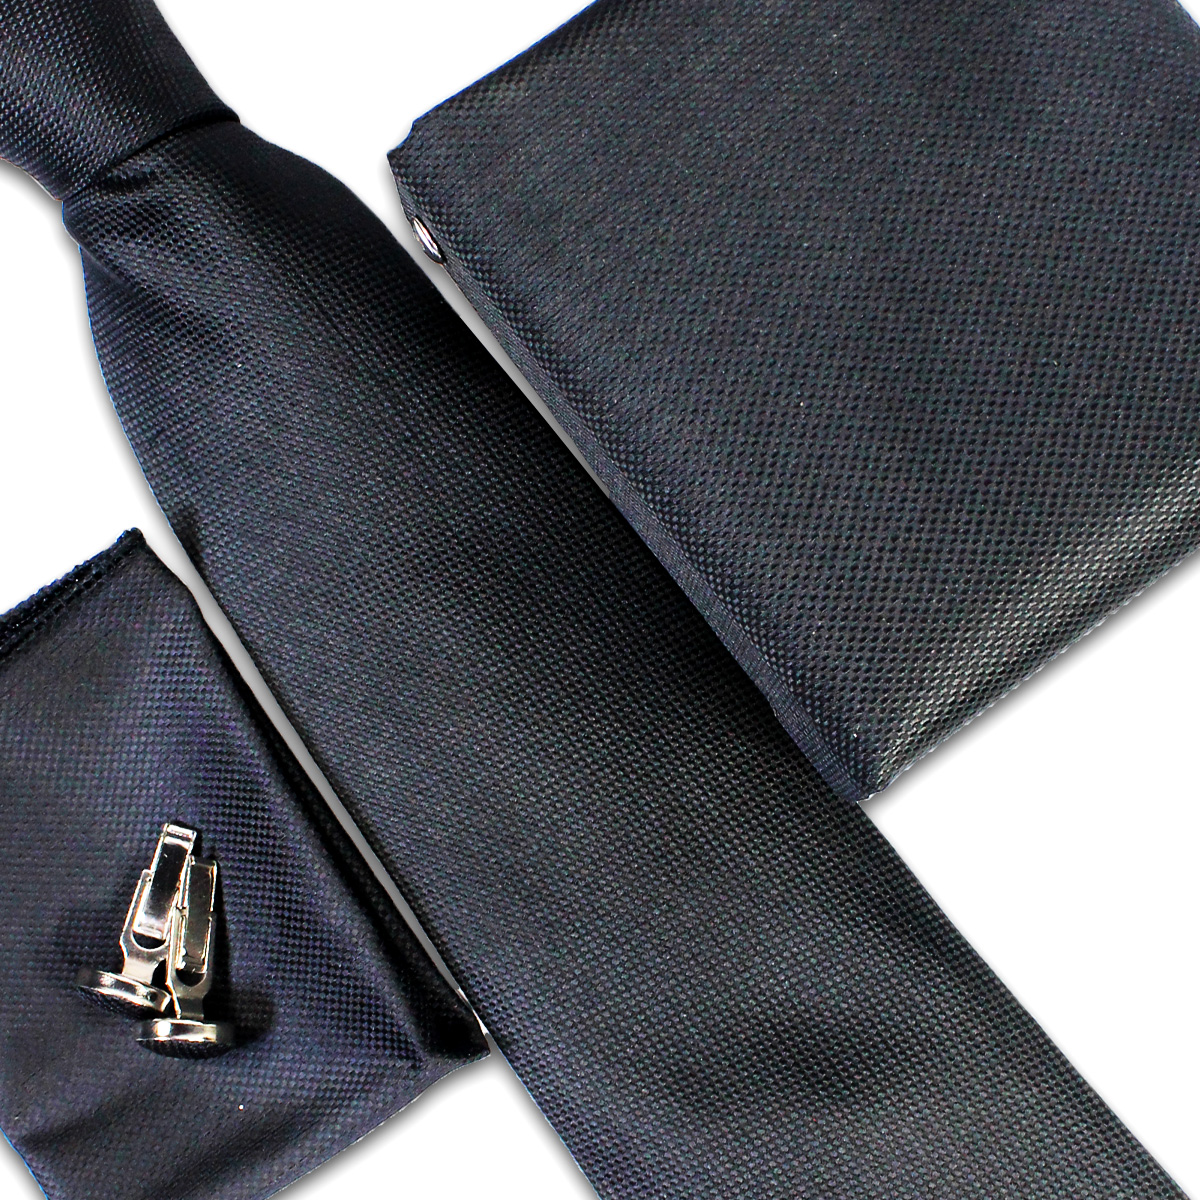 Cut Price Tie Gift Box Set 3 Pcs Tie Cuff-Link Pocket Square Black Dots Pattern